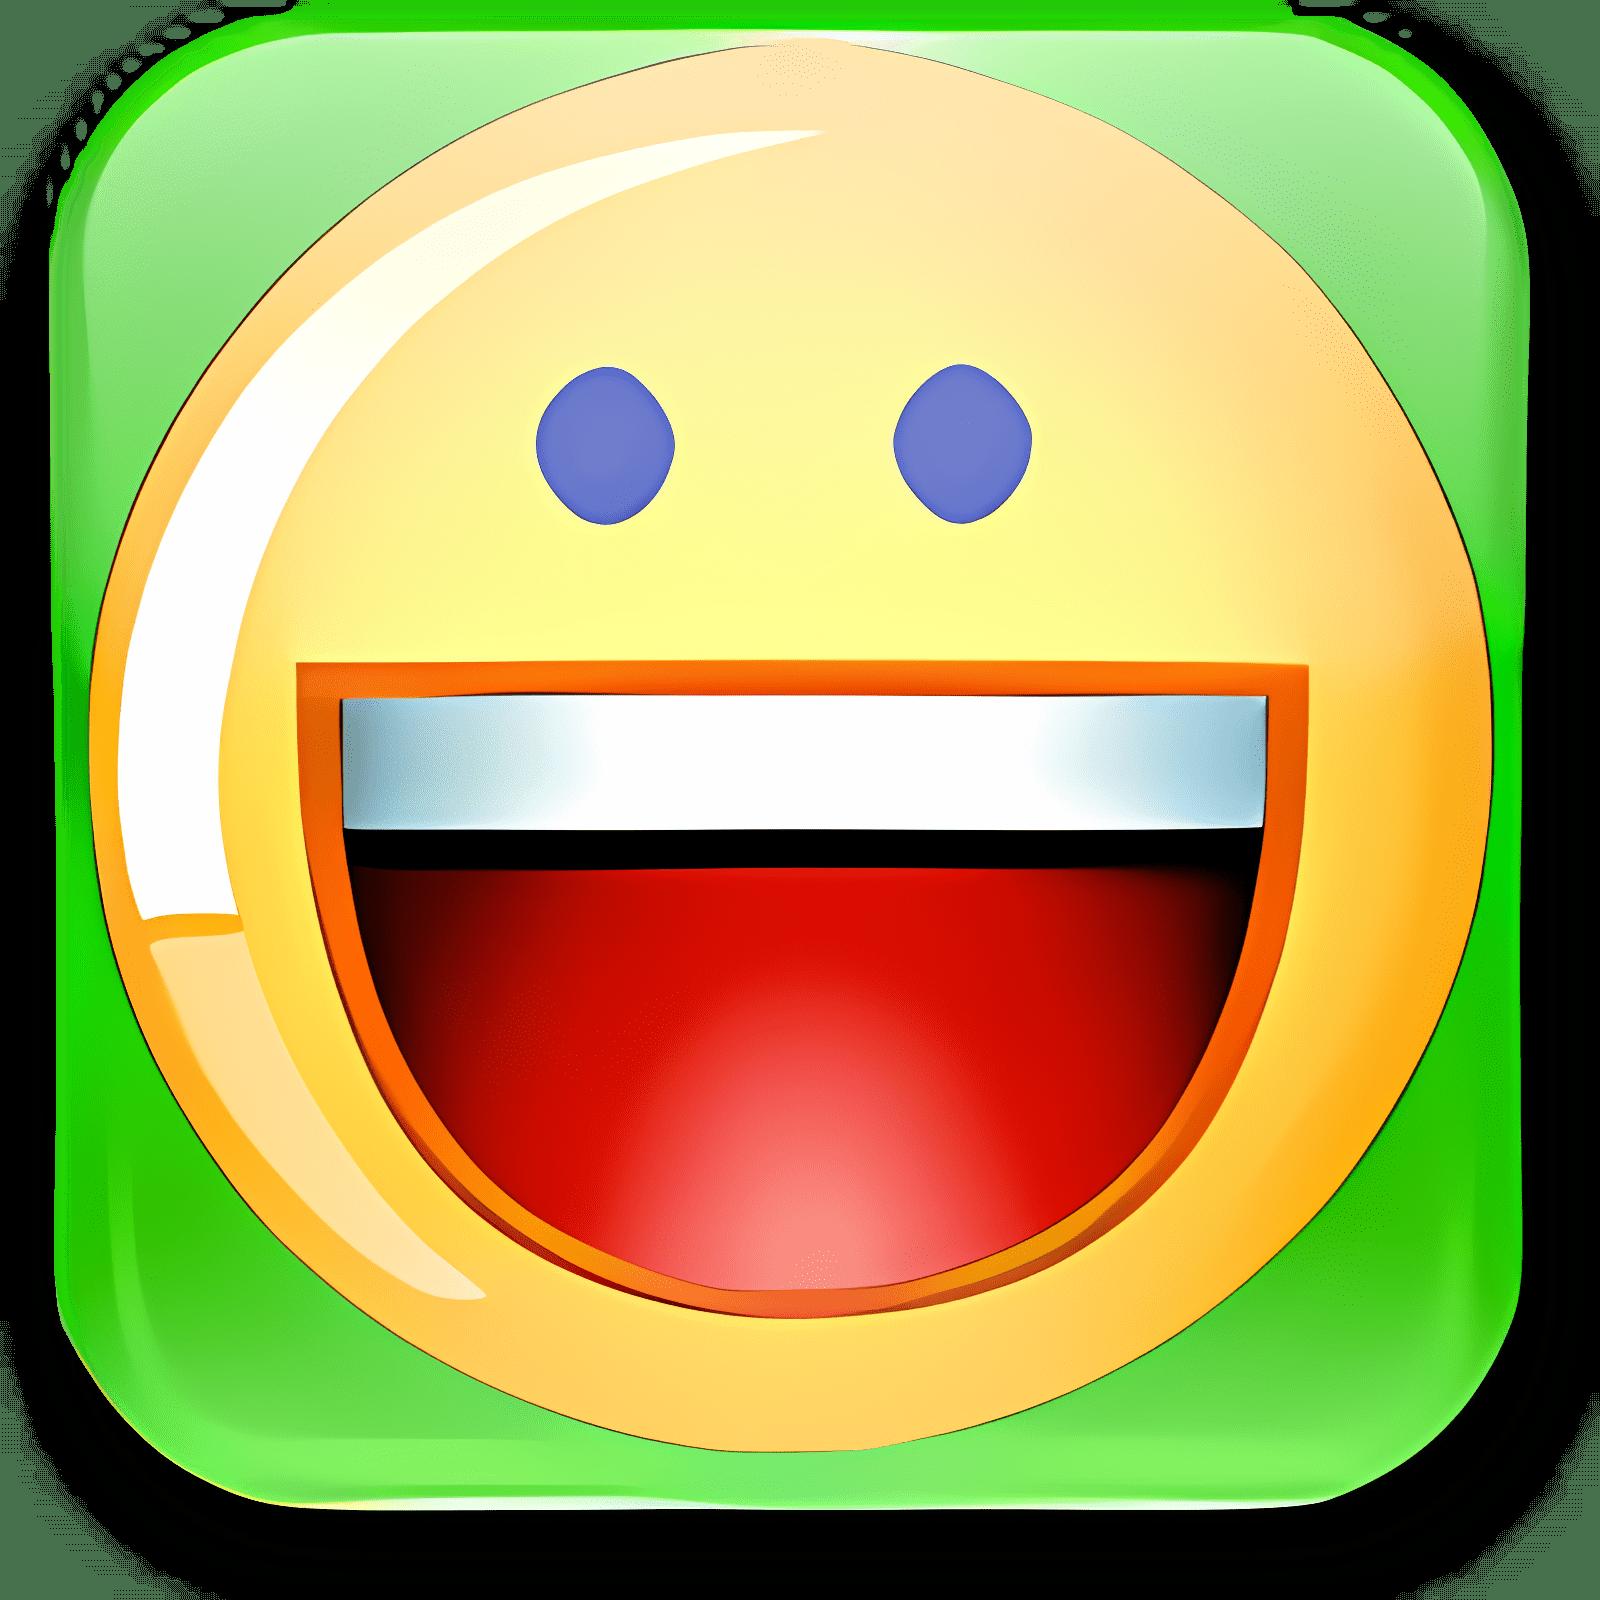 Yahoo! Messenger for Mac